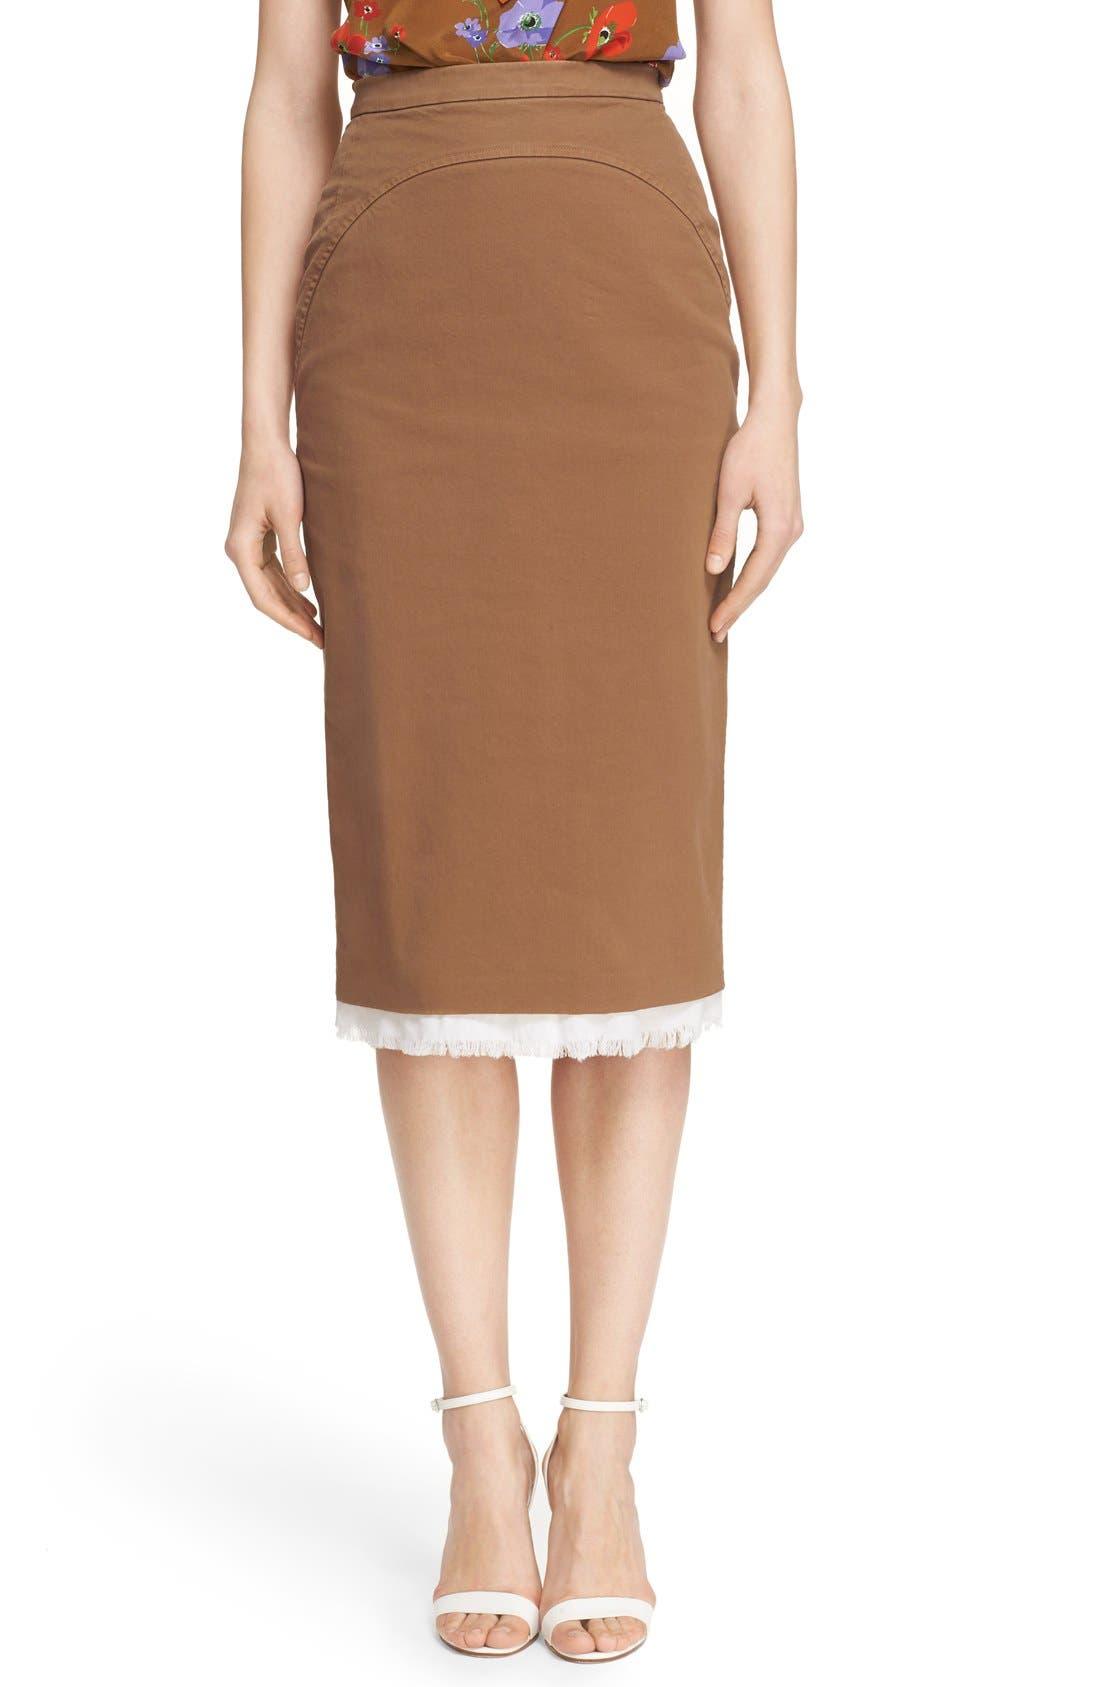 Alternate Image 1 Selected - Nº21 'Lison' Frayed Hem Khaki Pencil Skirt